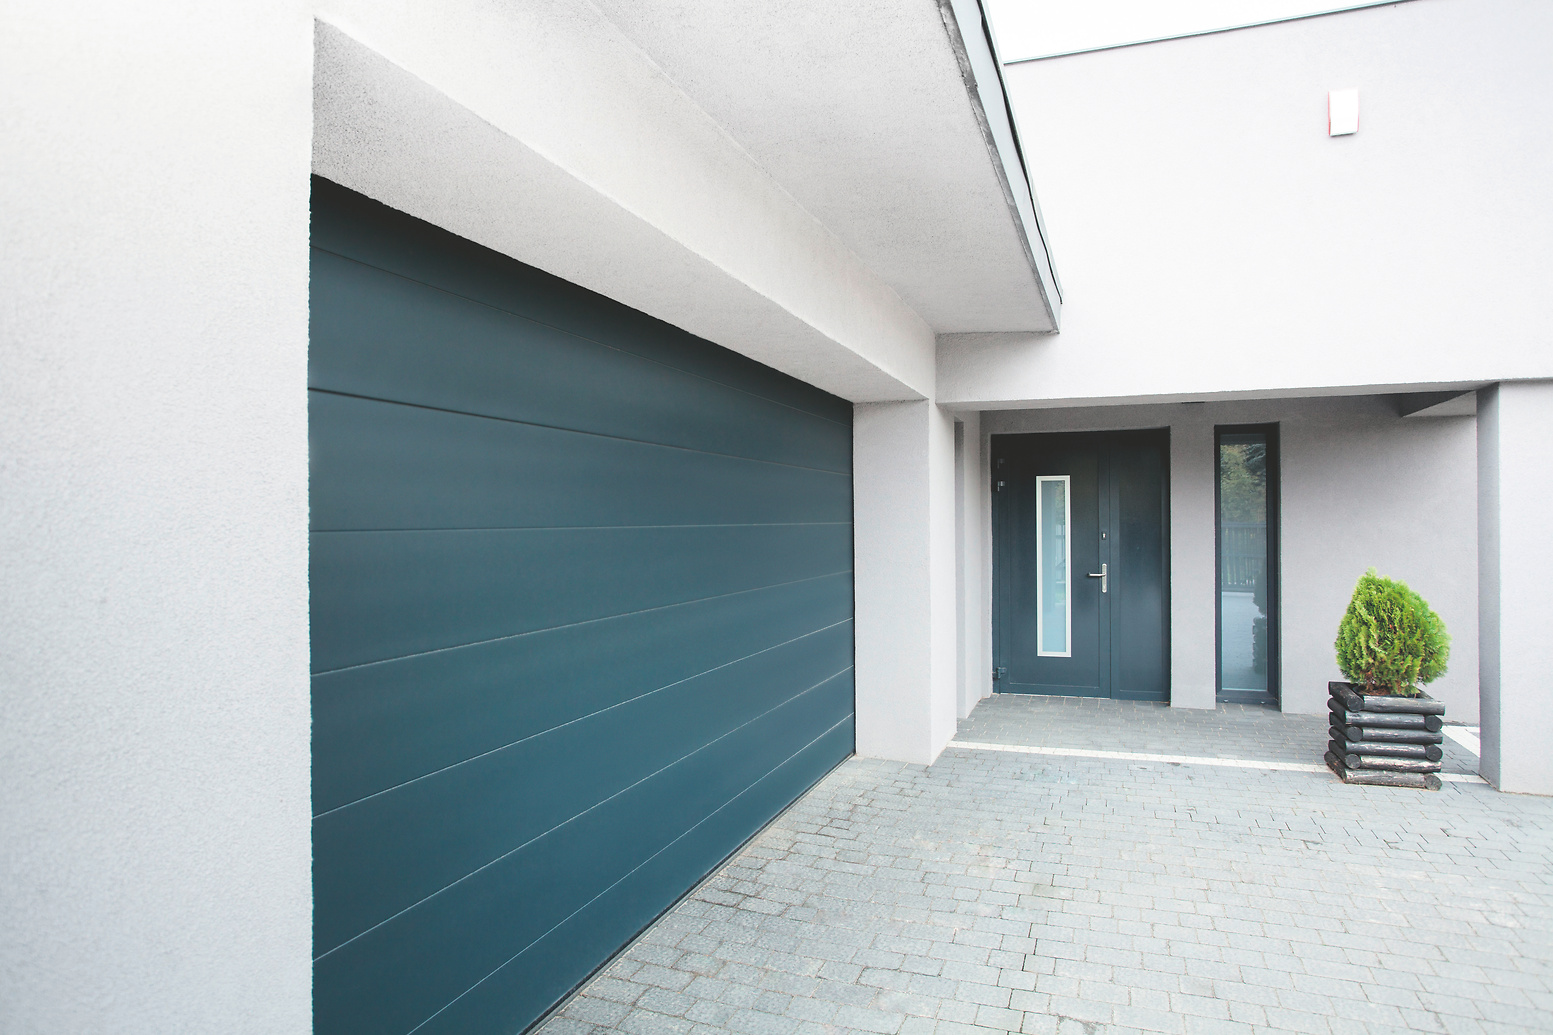 alpina fassadenfarbe alpina farben. Black Bedroom Furniture Sets. Home Design Ideas